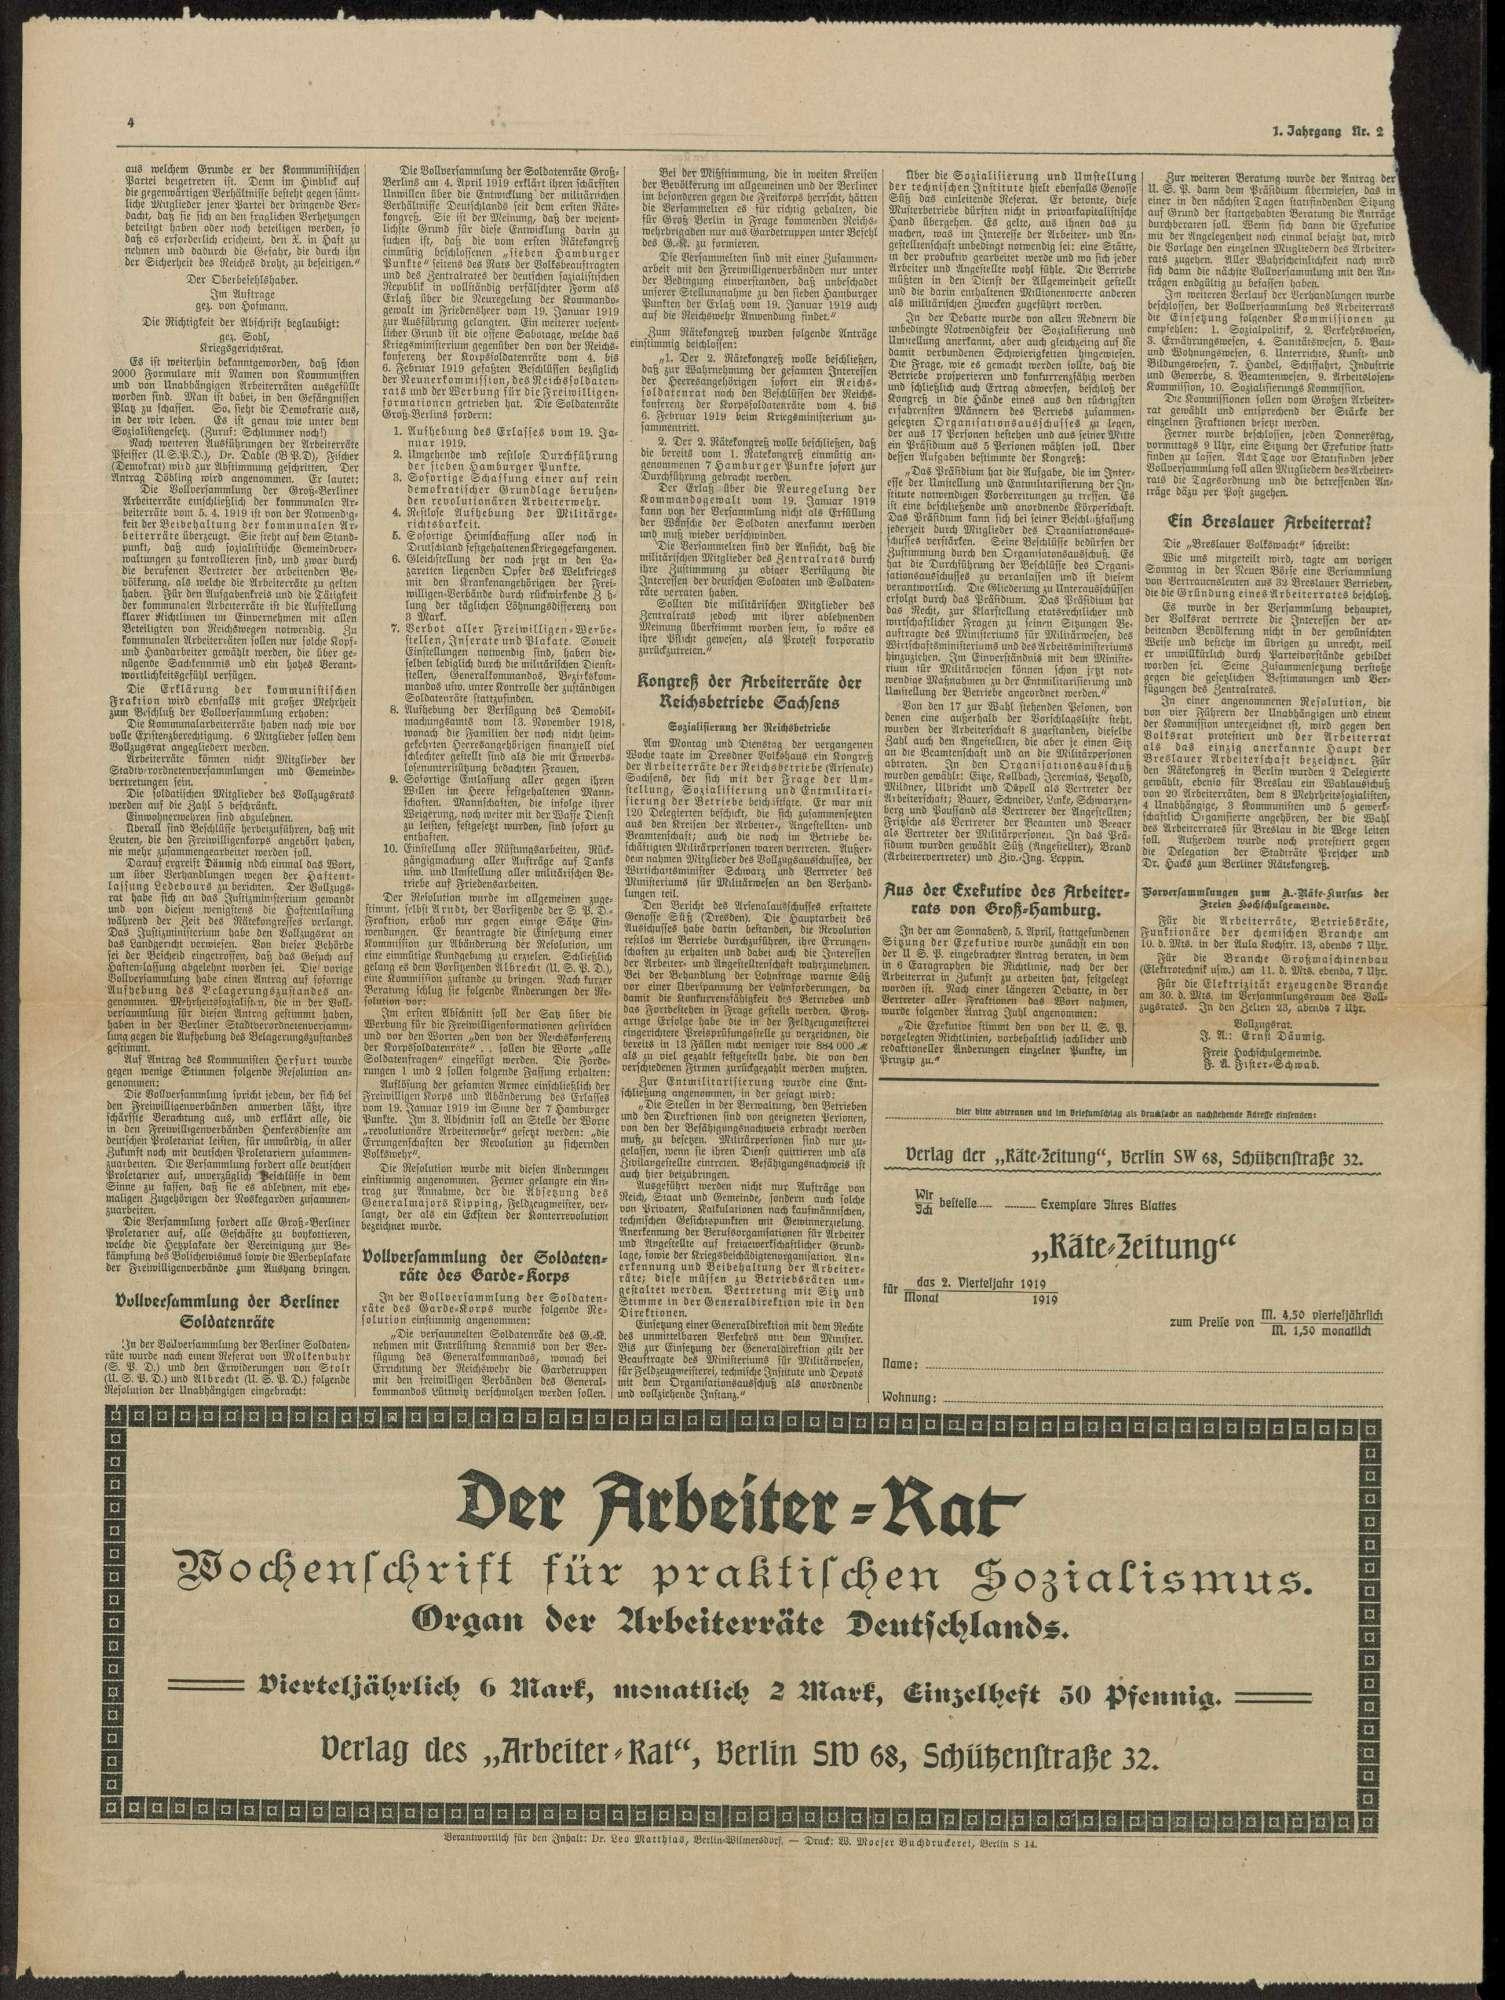 Rätezeitung, Bild 3